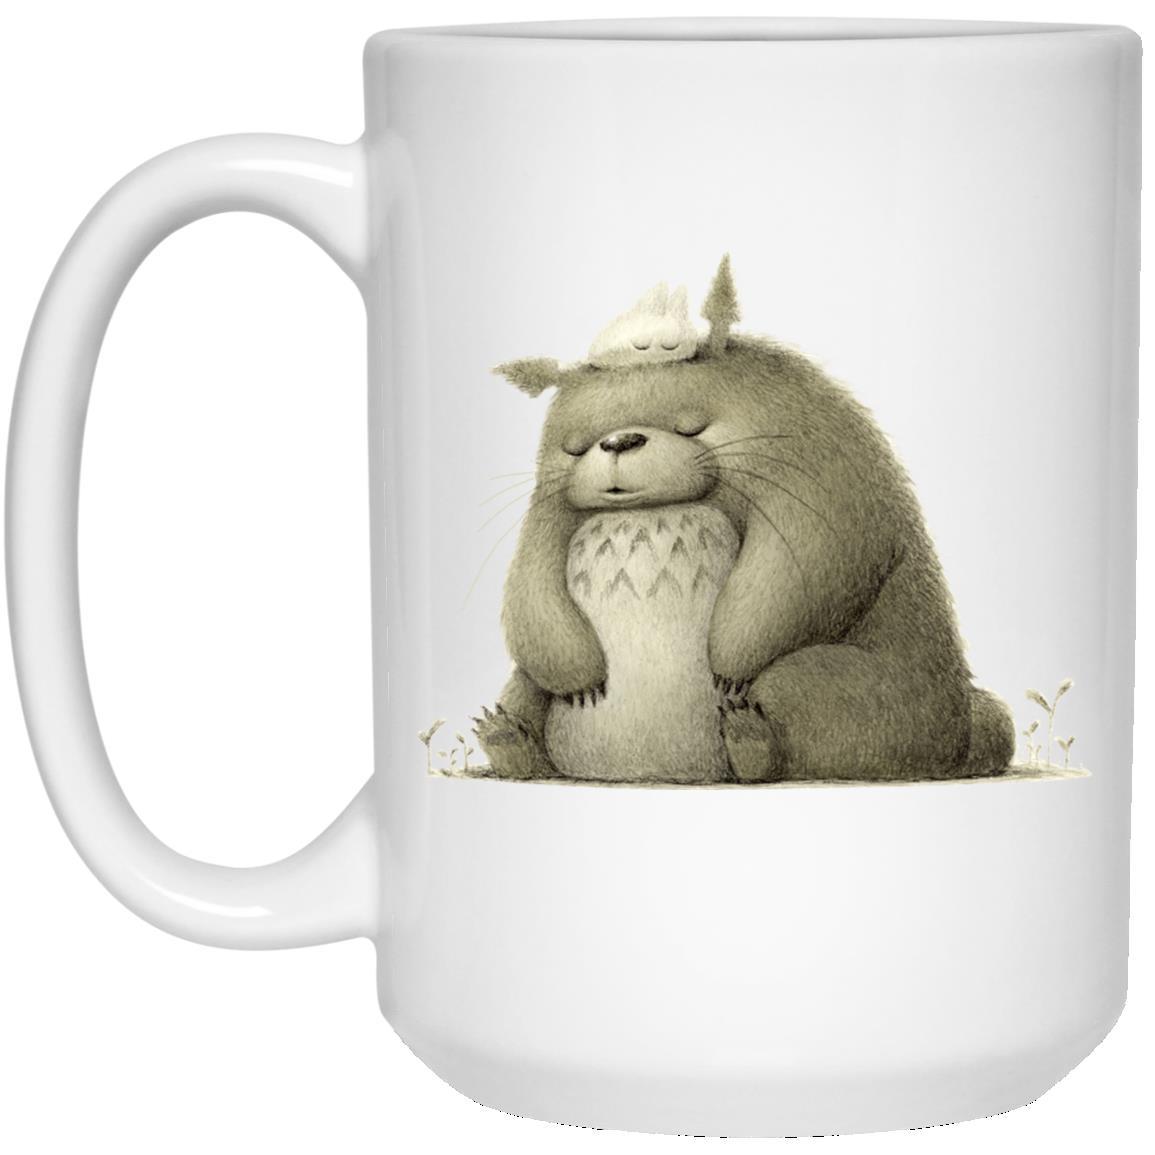 The Fluffy Totoro Mug